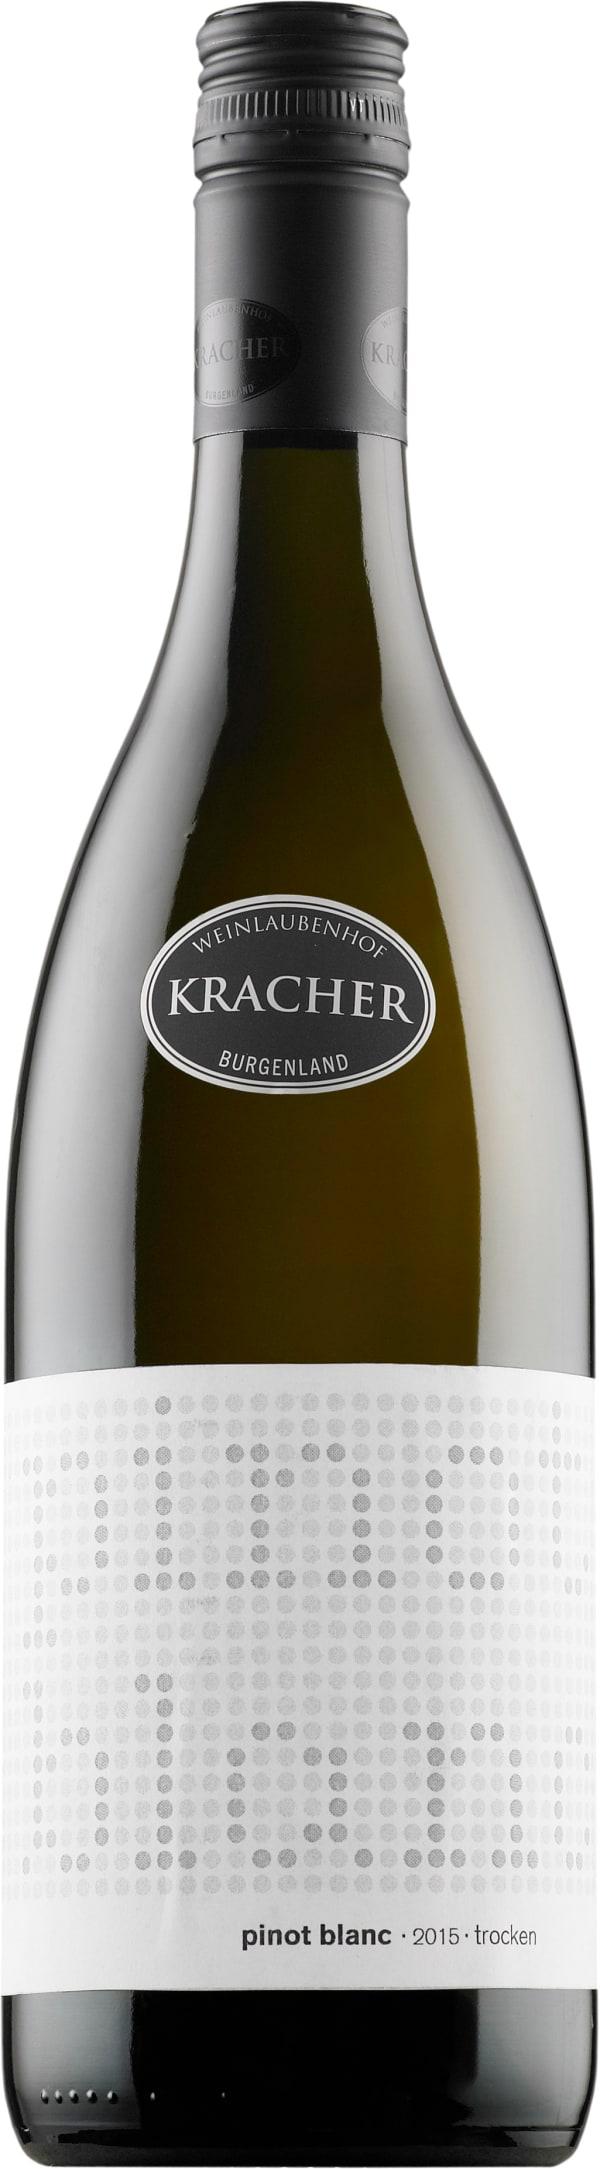 Kracher Pinot Blanc 2016